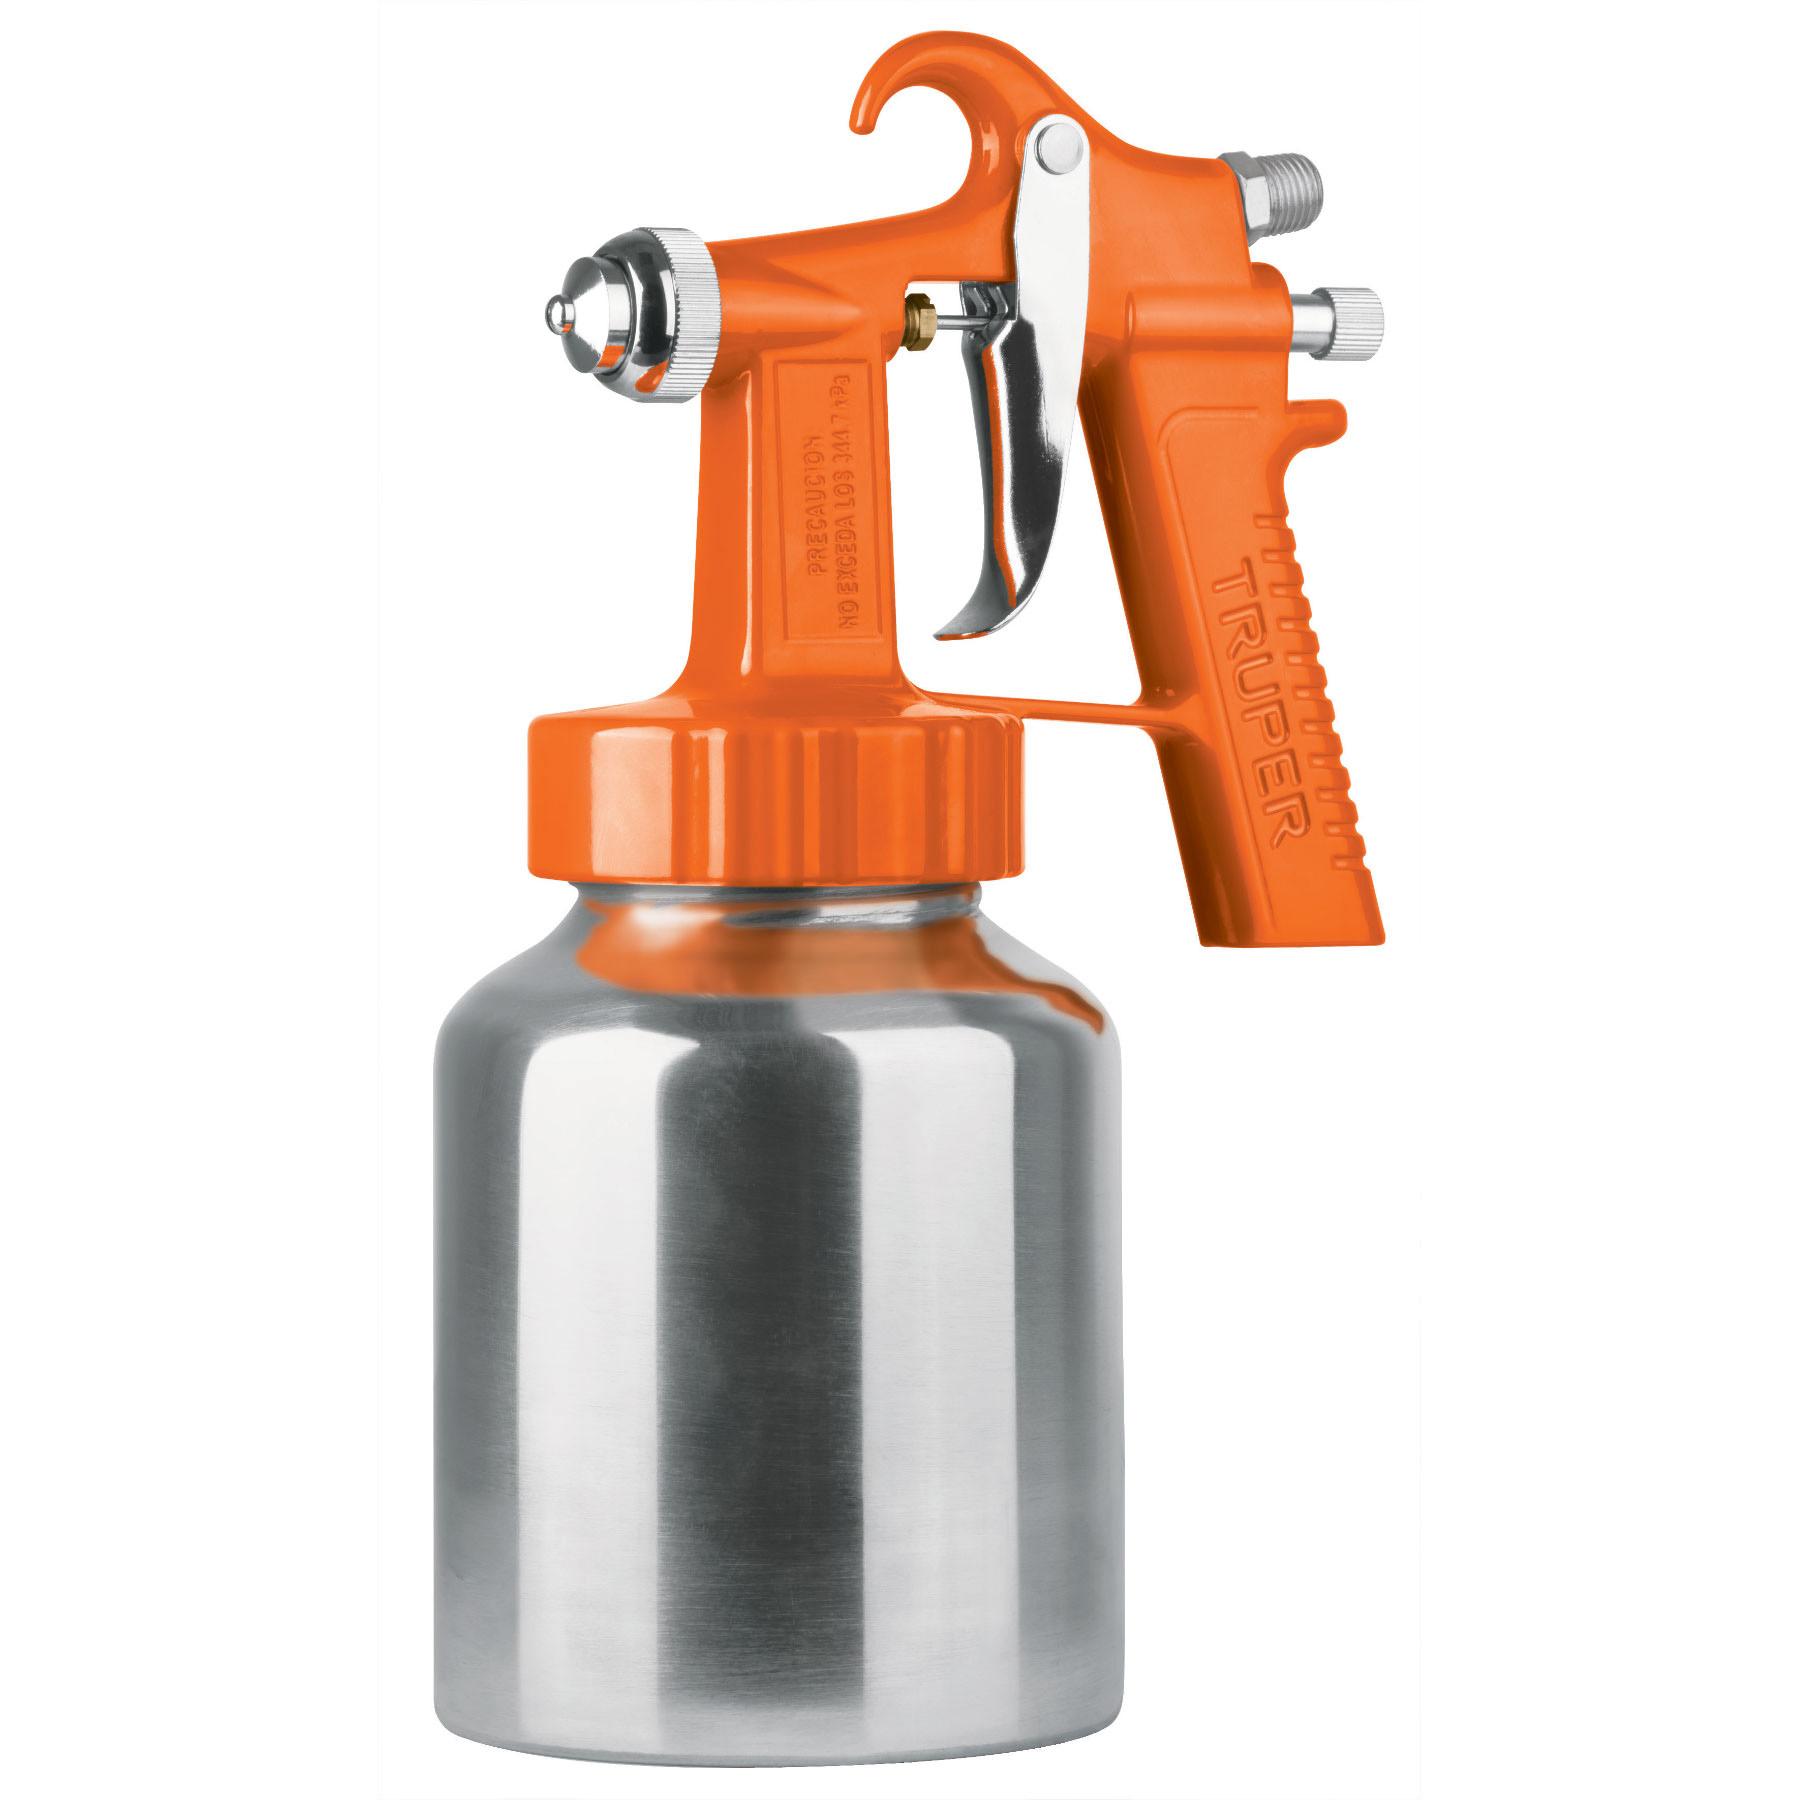 Truper - Pistola p/pintar baja presión, naranja, entrada superior